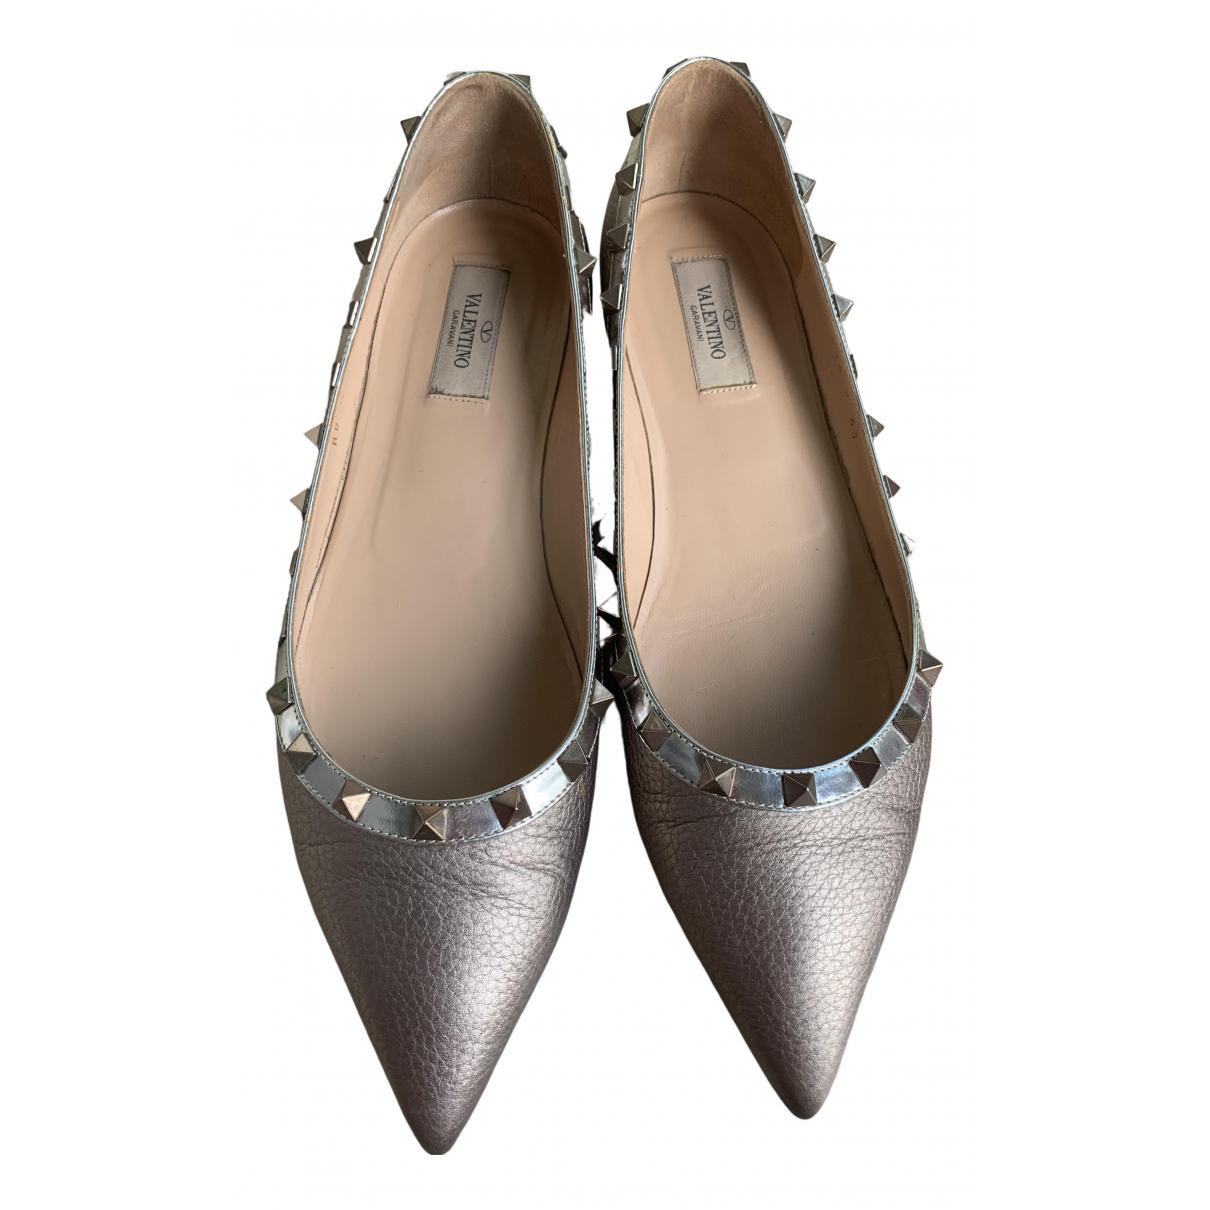 Valentino Garavani Rockstud Metallic Leather Ballet flats for Women 41 EU